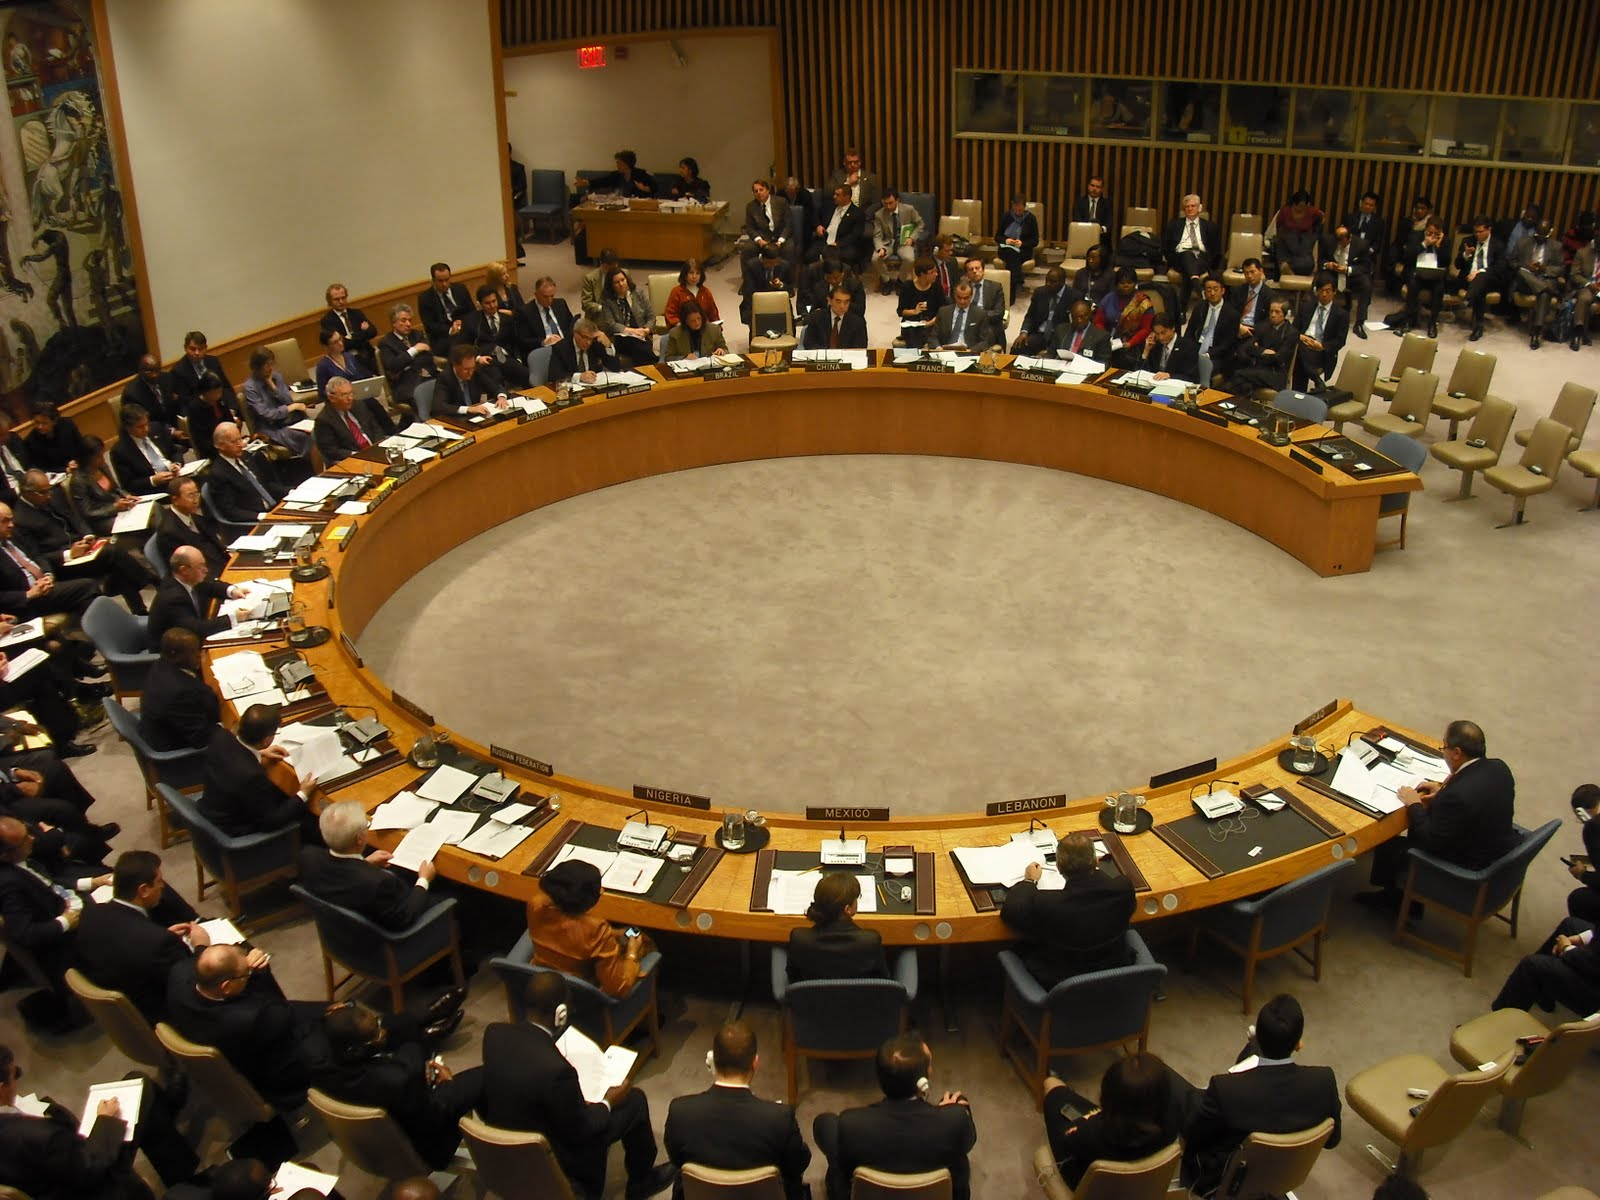 Un Security Council Reforms Mission Impossible